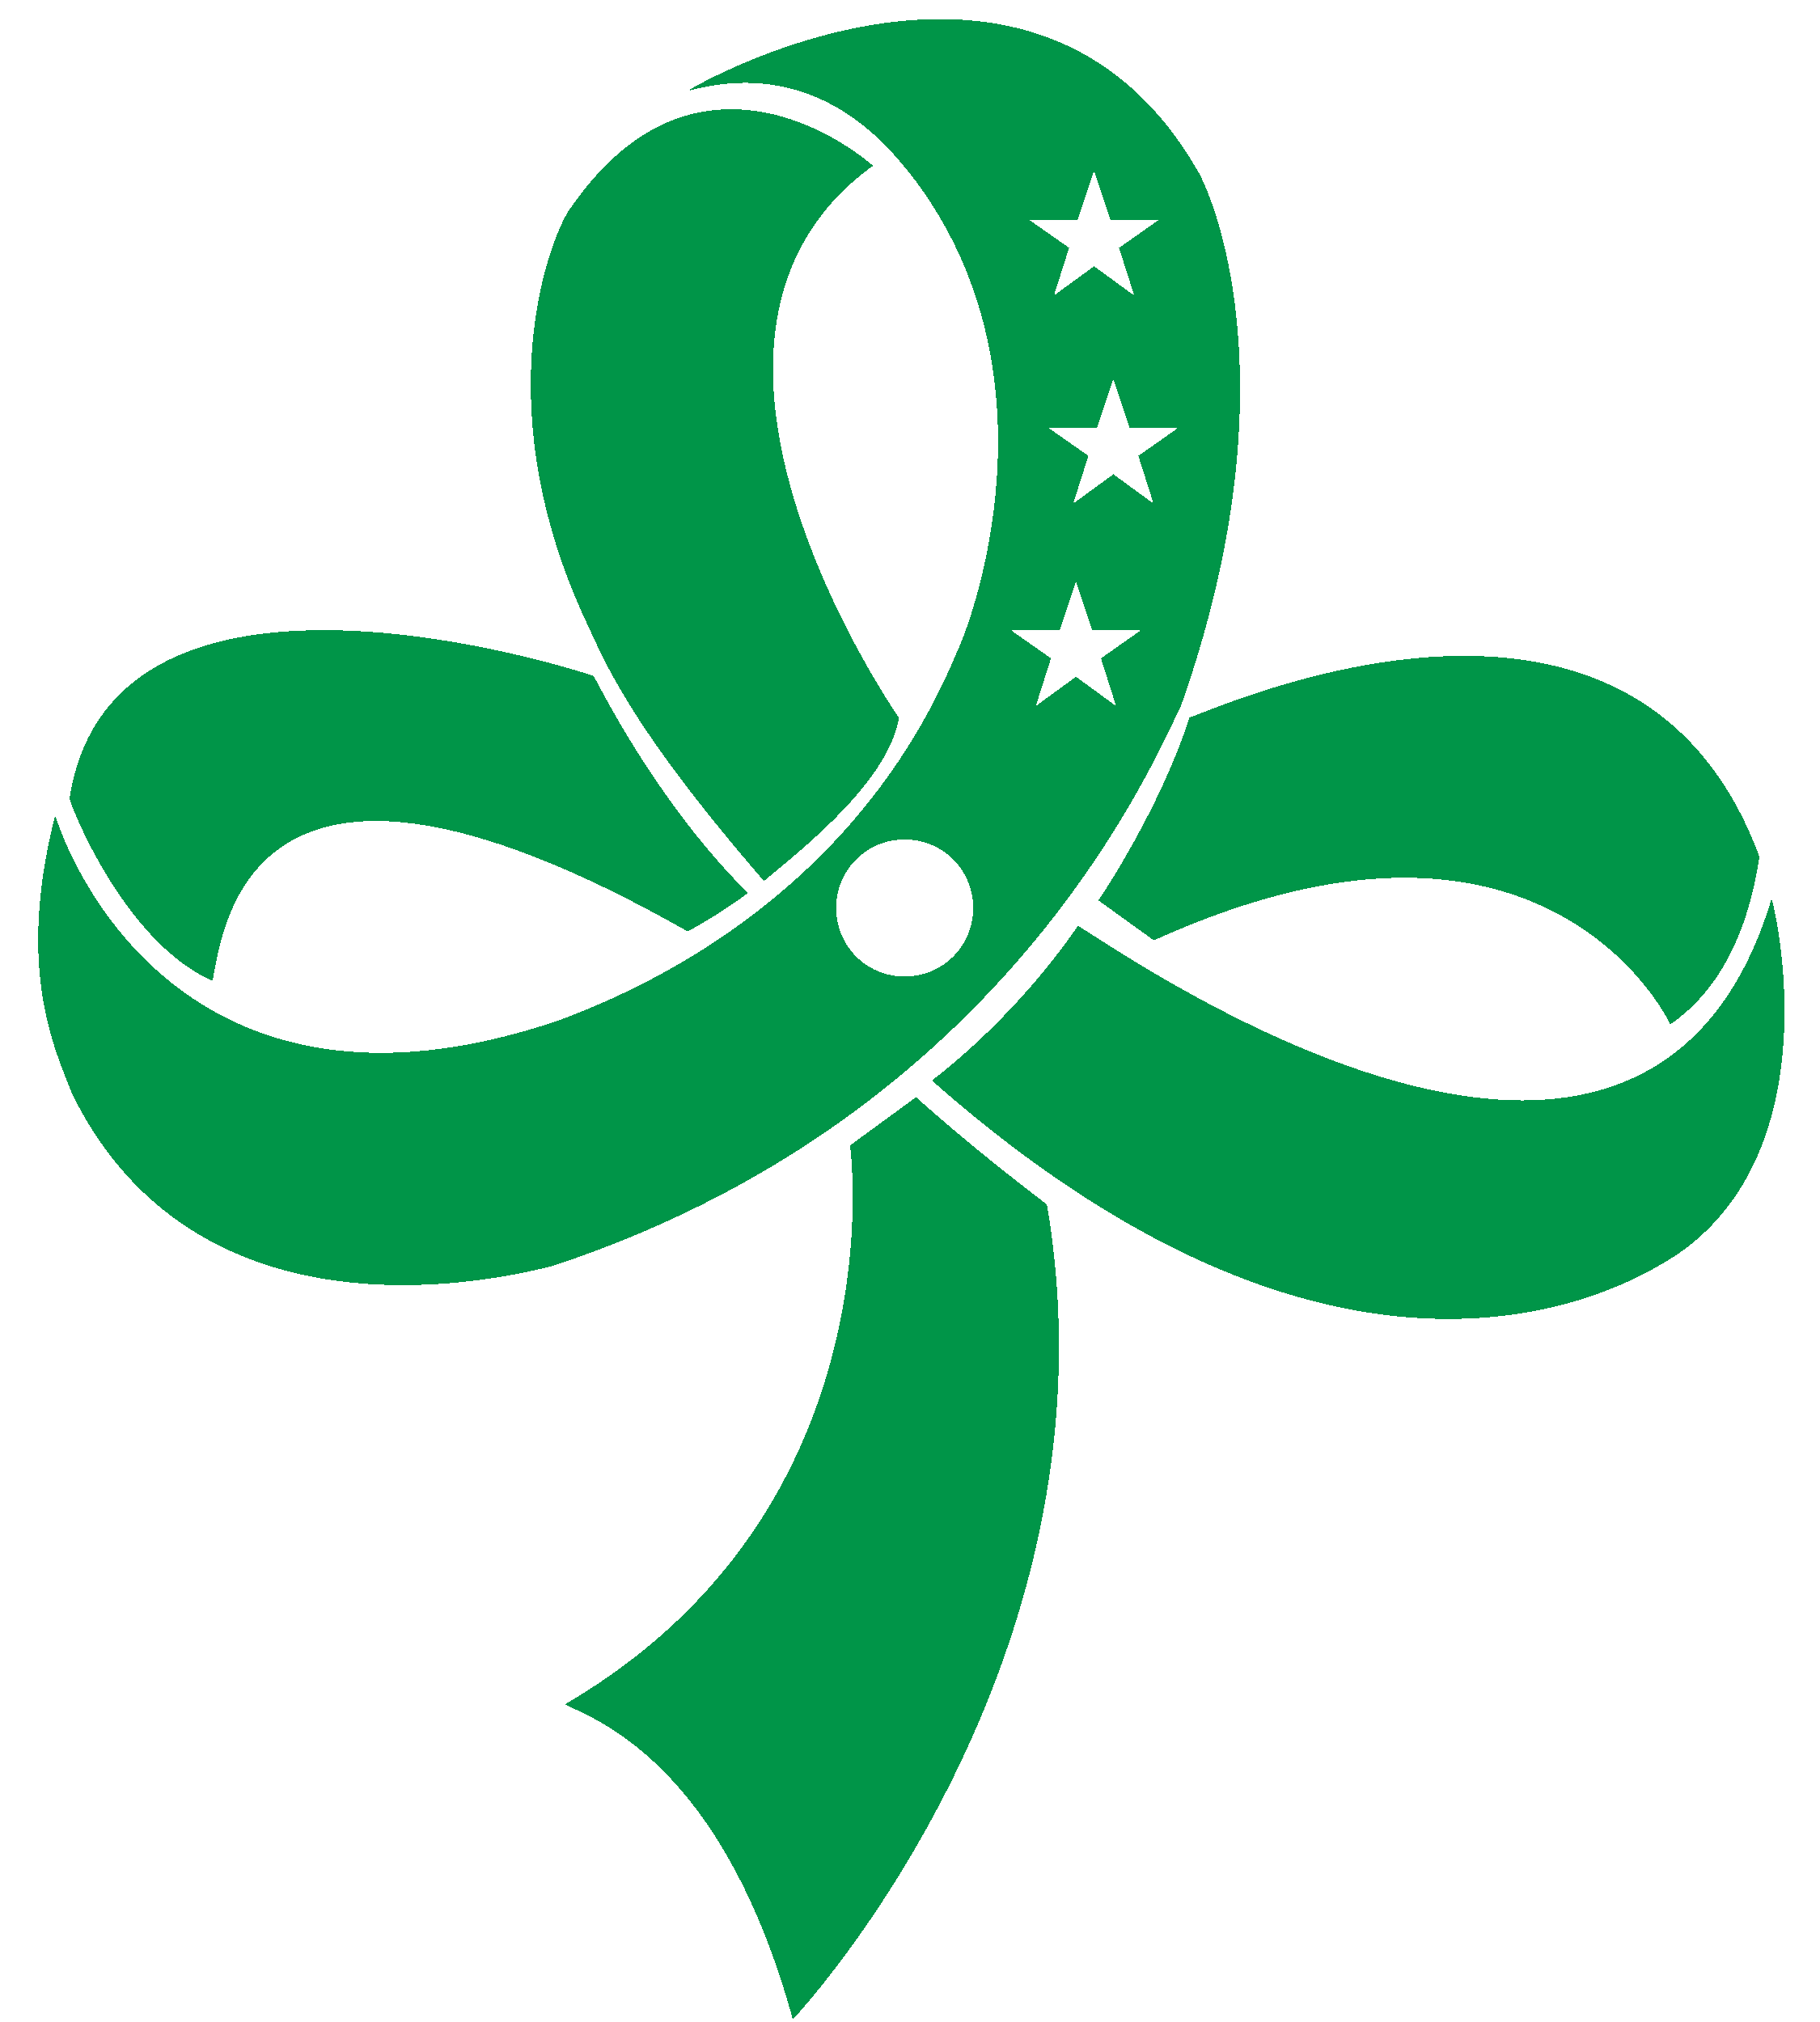 GSP logo | Girl scout logo, Girl scout ideas, Girl scouts